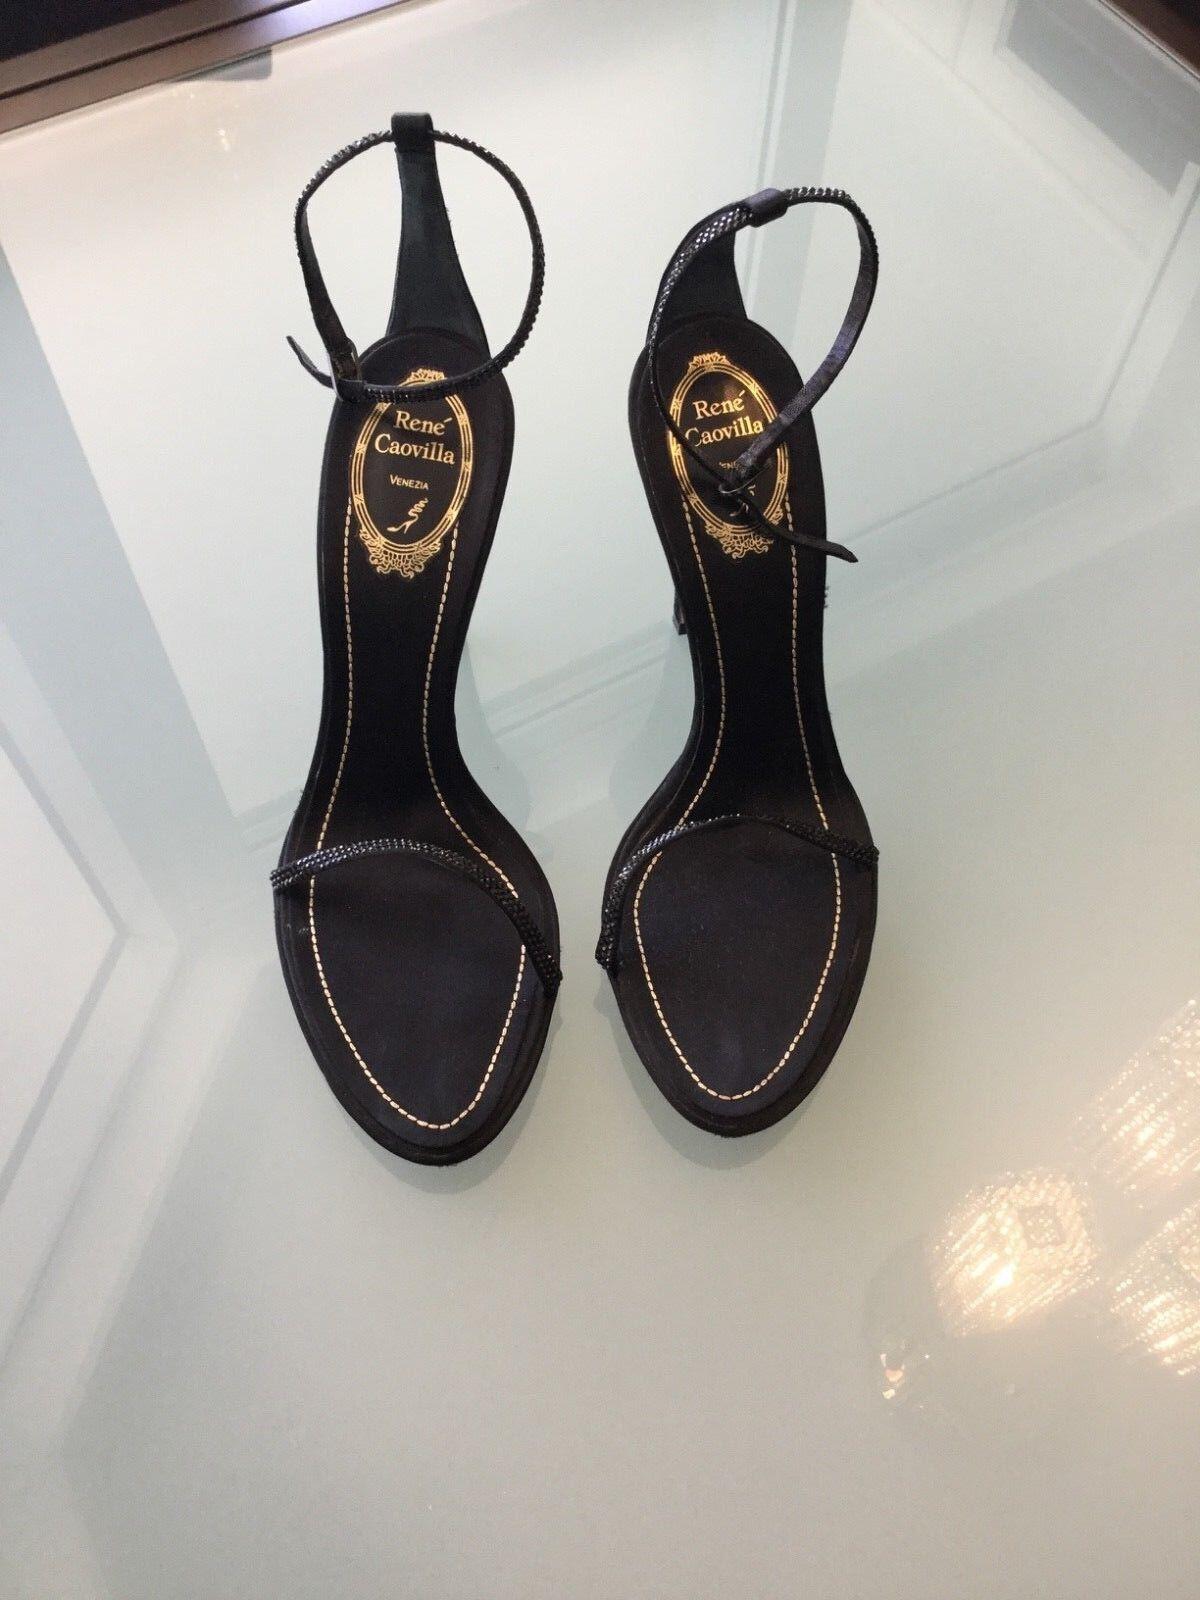 colorways incredibili RENE CAOVILLA VENEZIA crystal crystal crystal heels Donna's scarpe sandals 40 10 bronze nero  conveniente